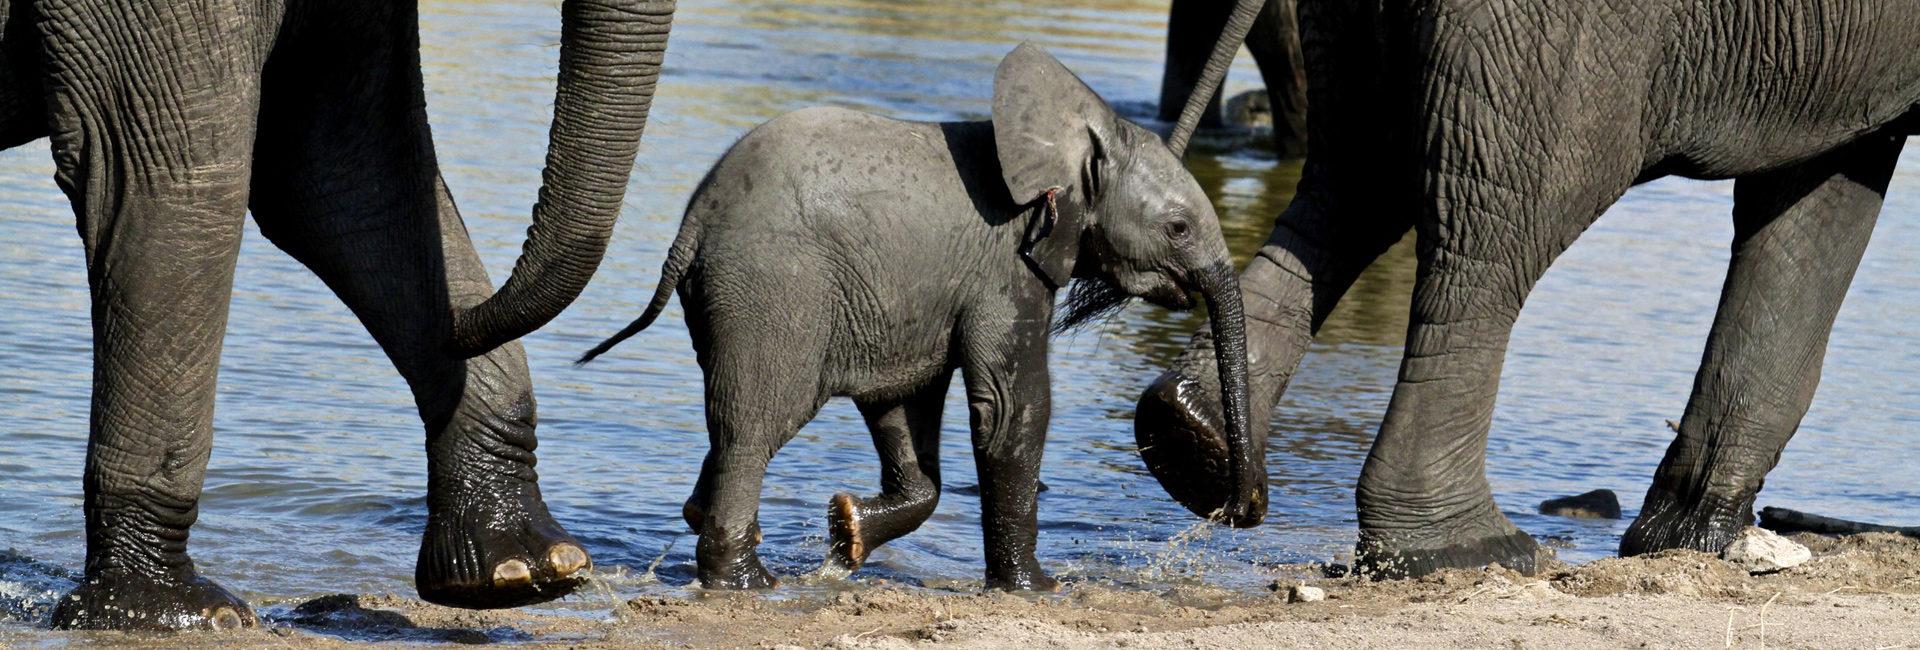 Amazing Elephant Sightings